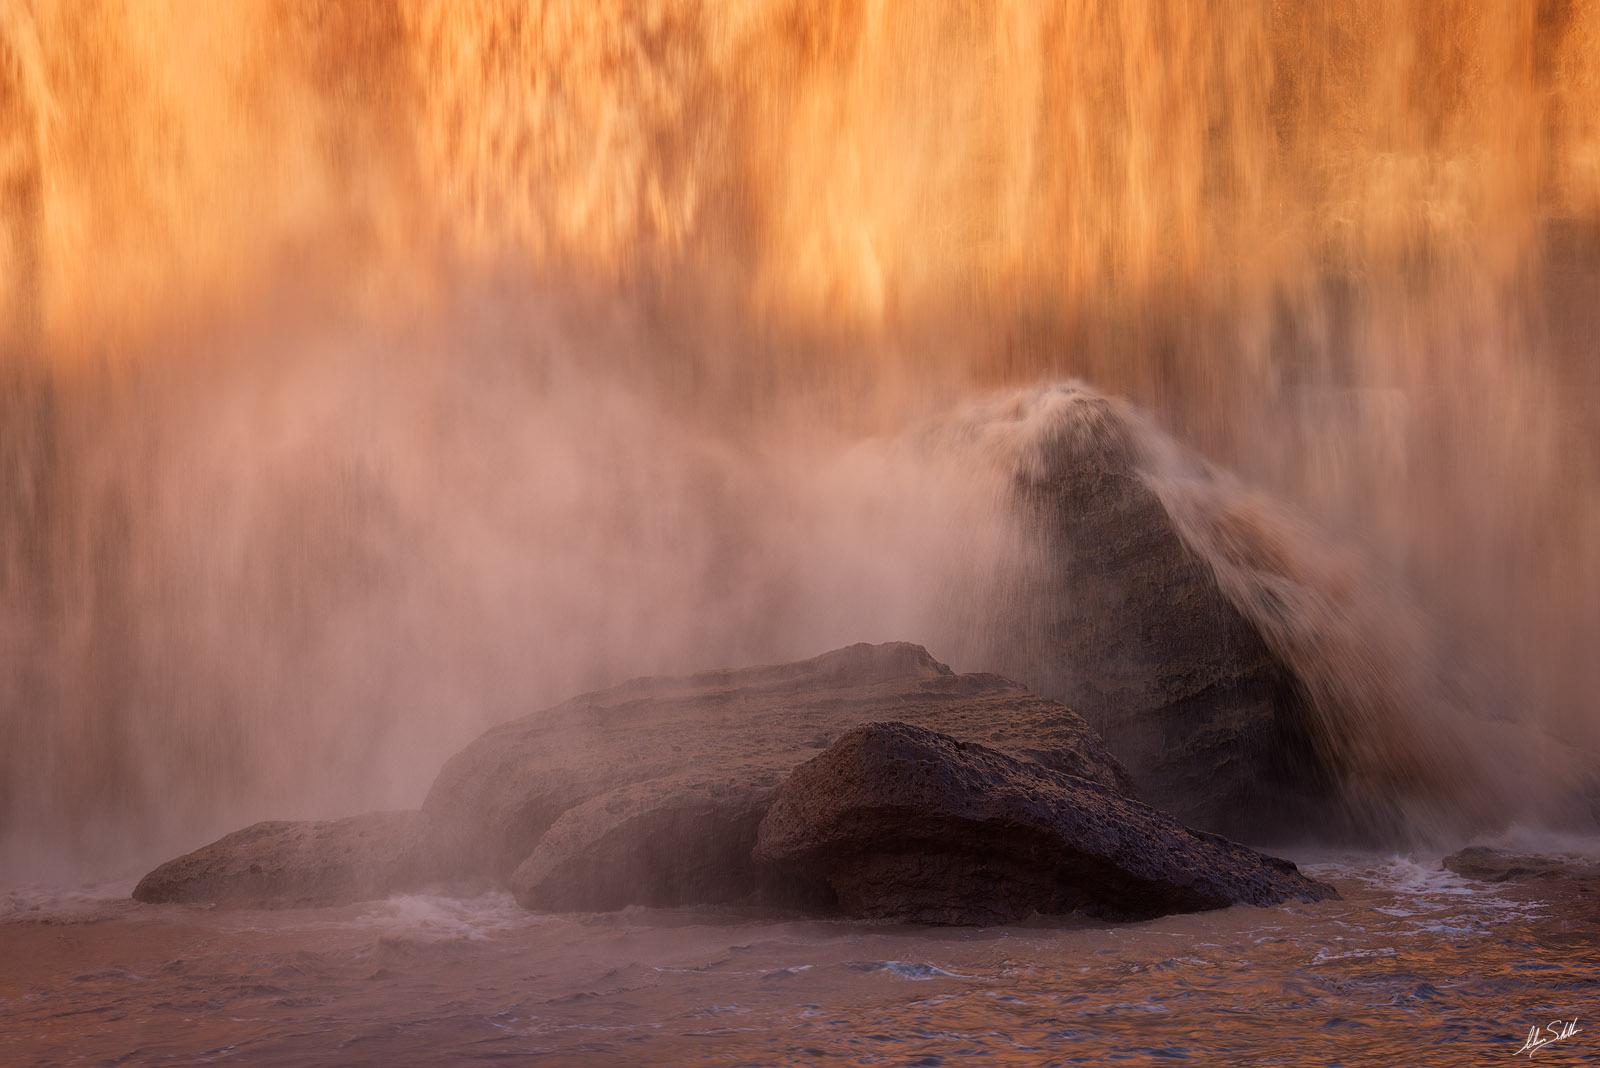 AZ, Arizona, Chocolate Falls, Grand Falls, Little Colorado River, Painted Desert, Snowmelt, Waterfall, spring, photo